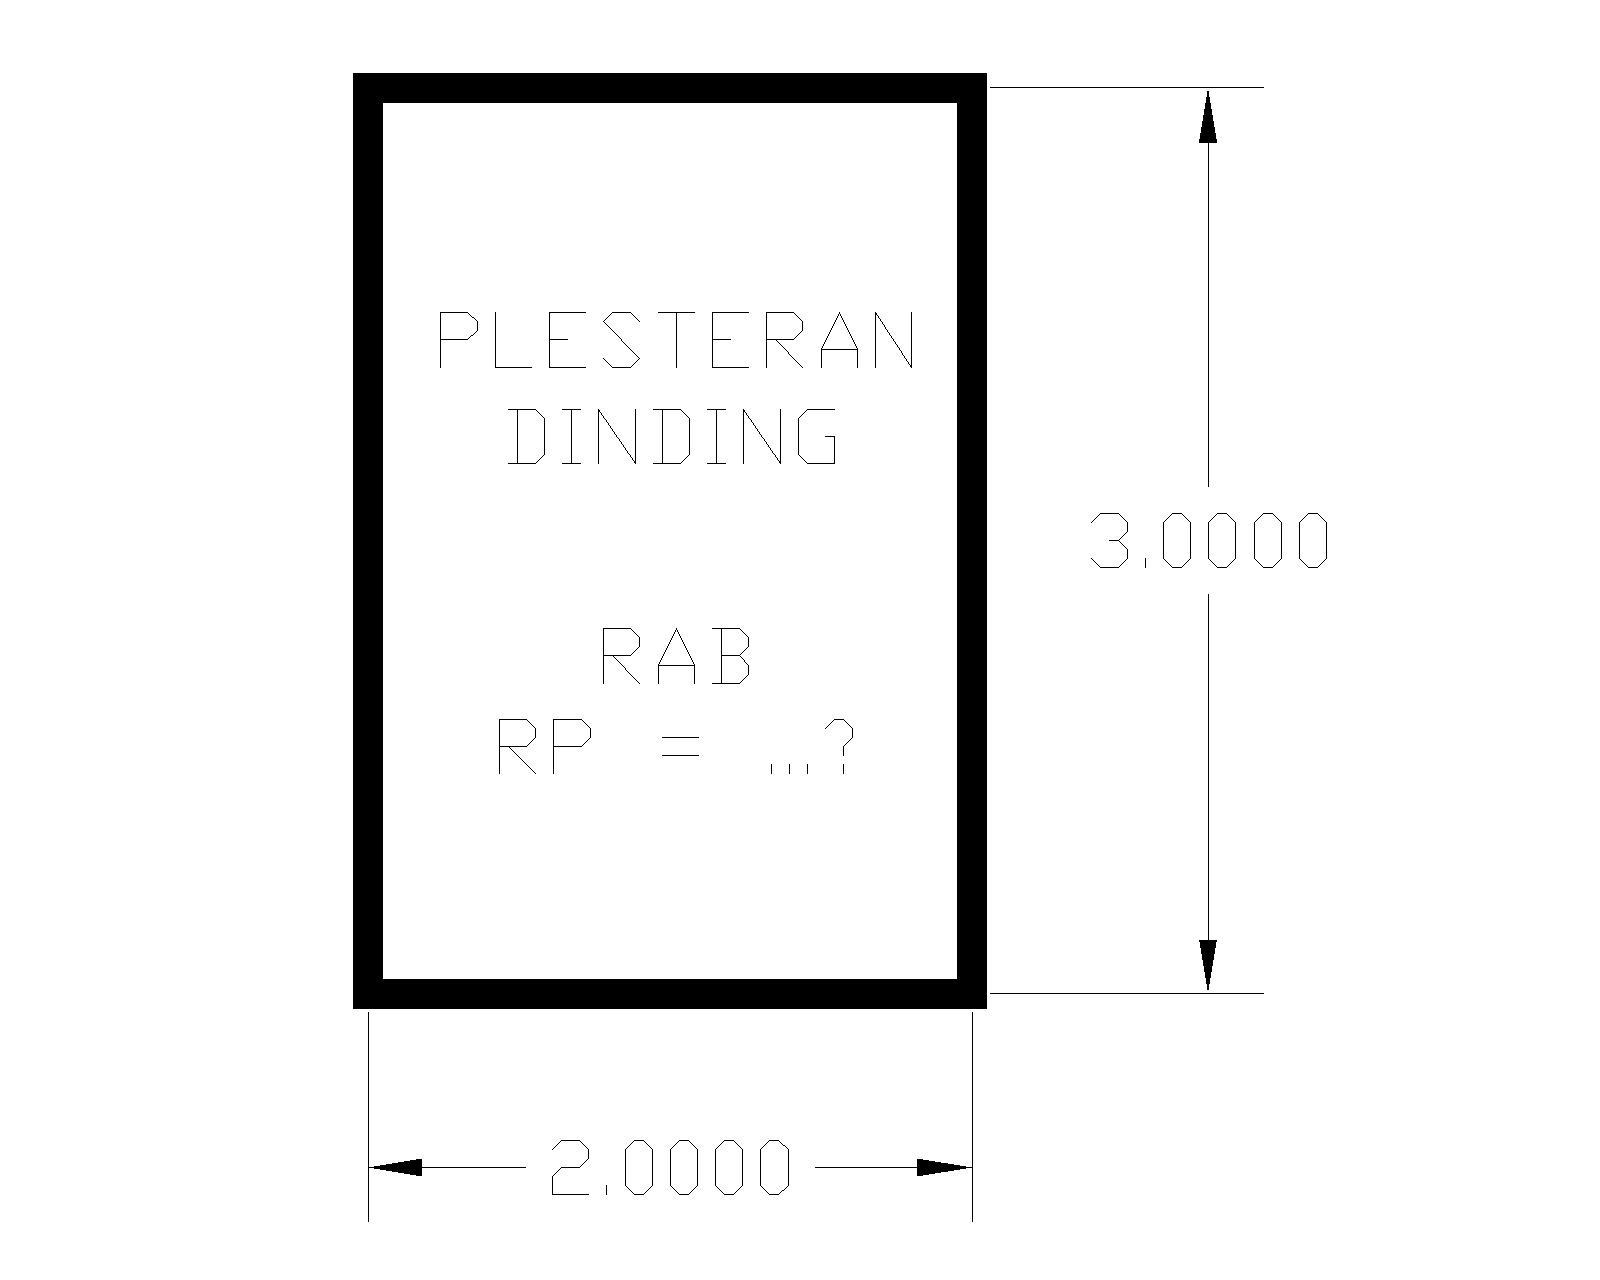 RAB PLESTERAN DINDING